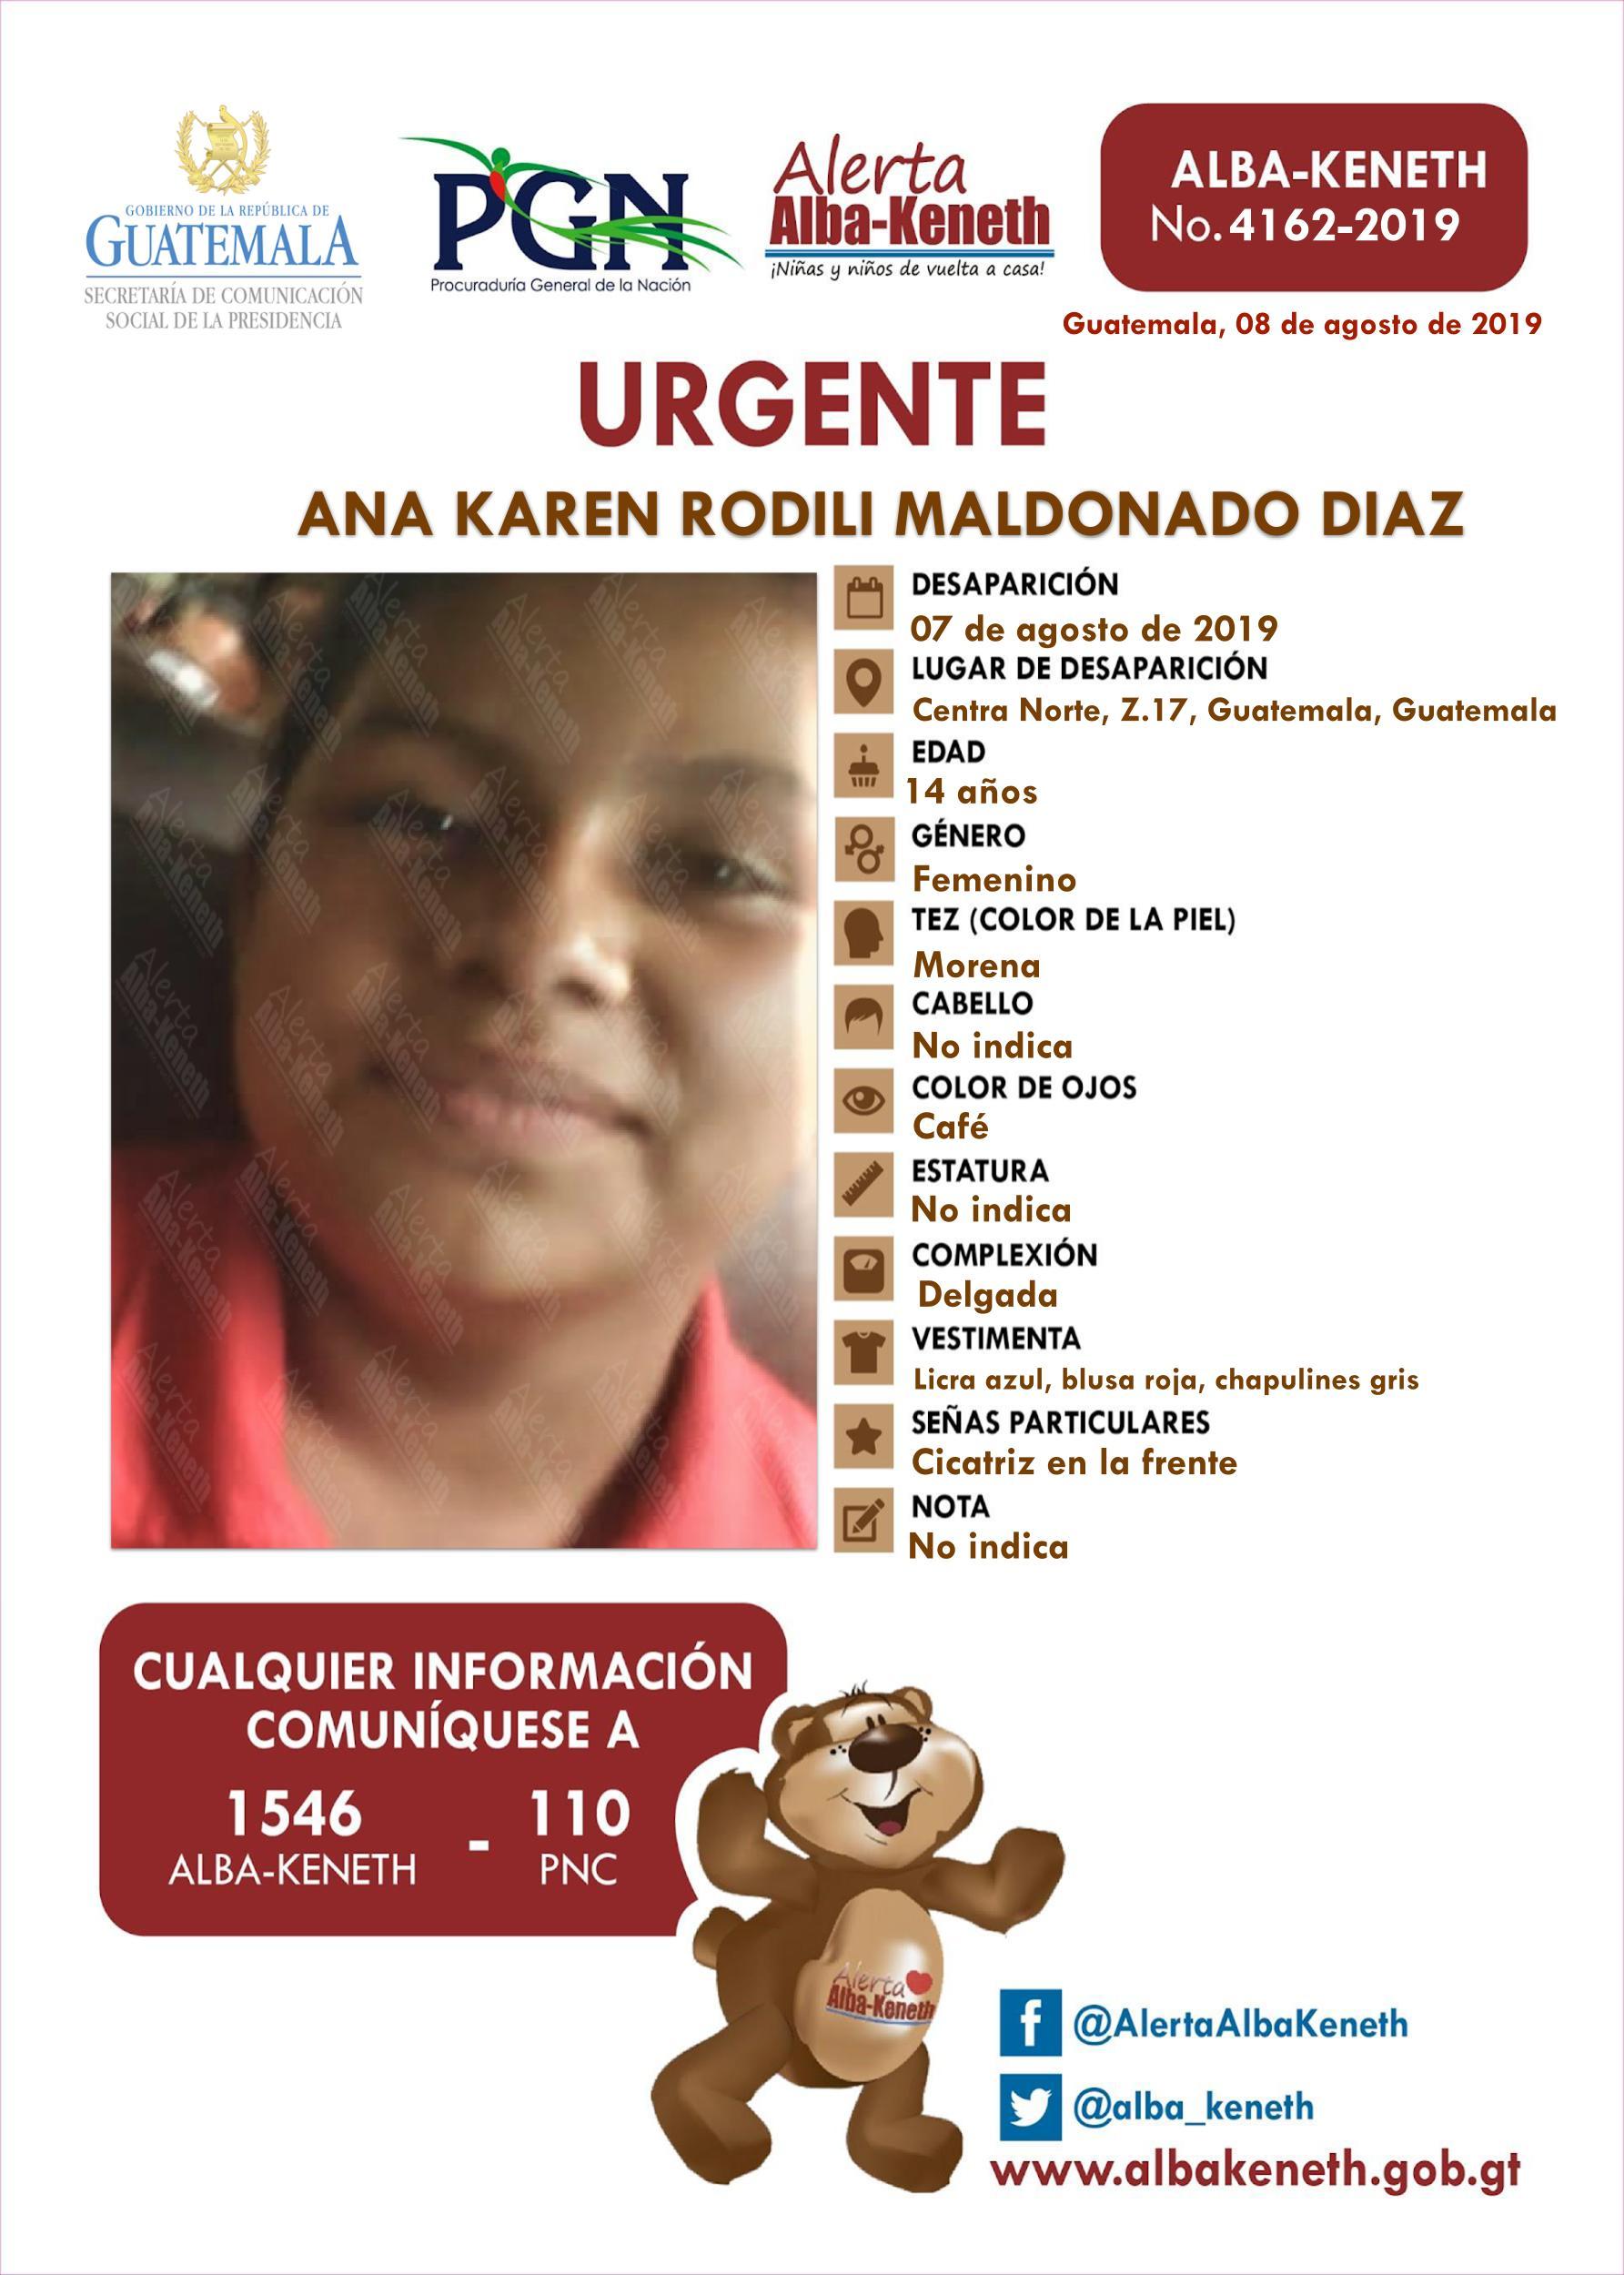 Ana Karen Rodili Maldonado Diaz